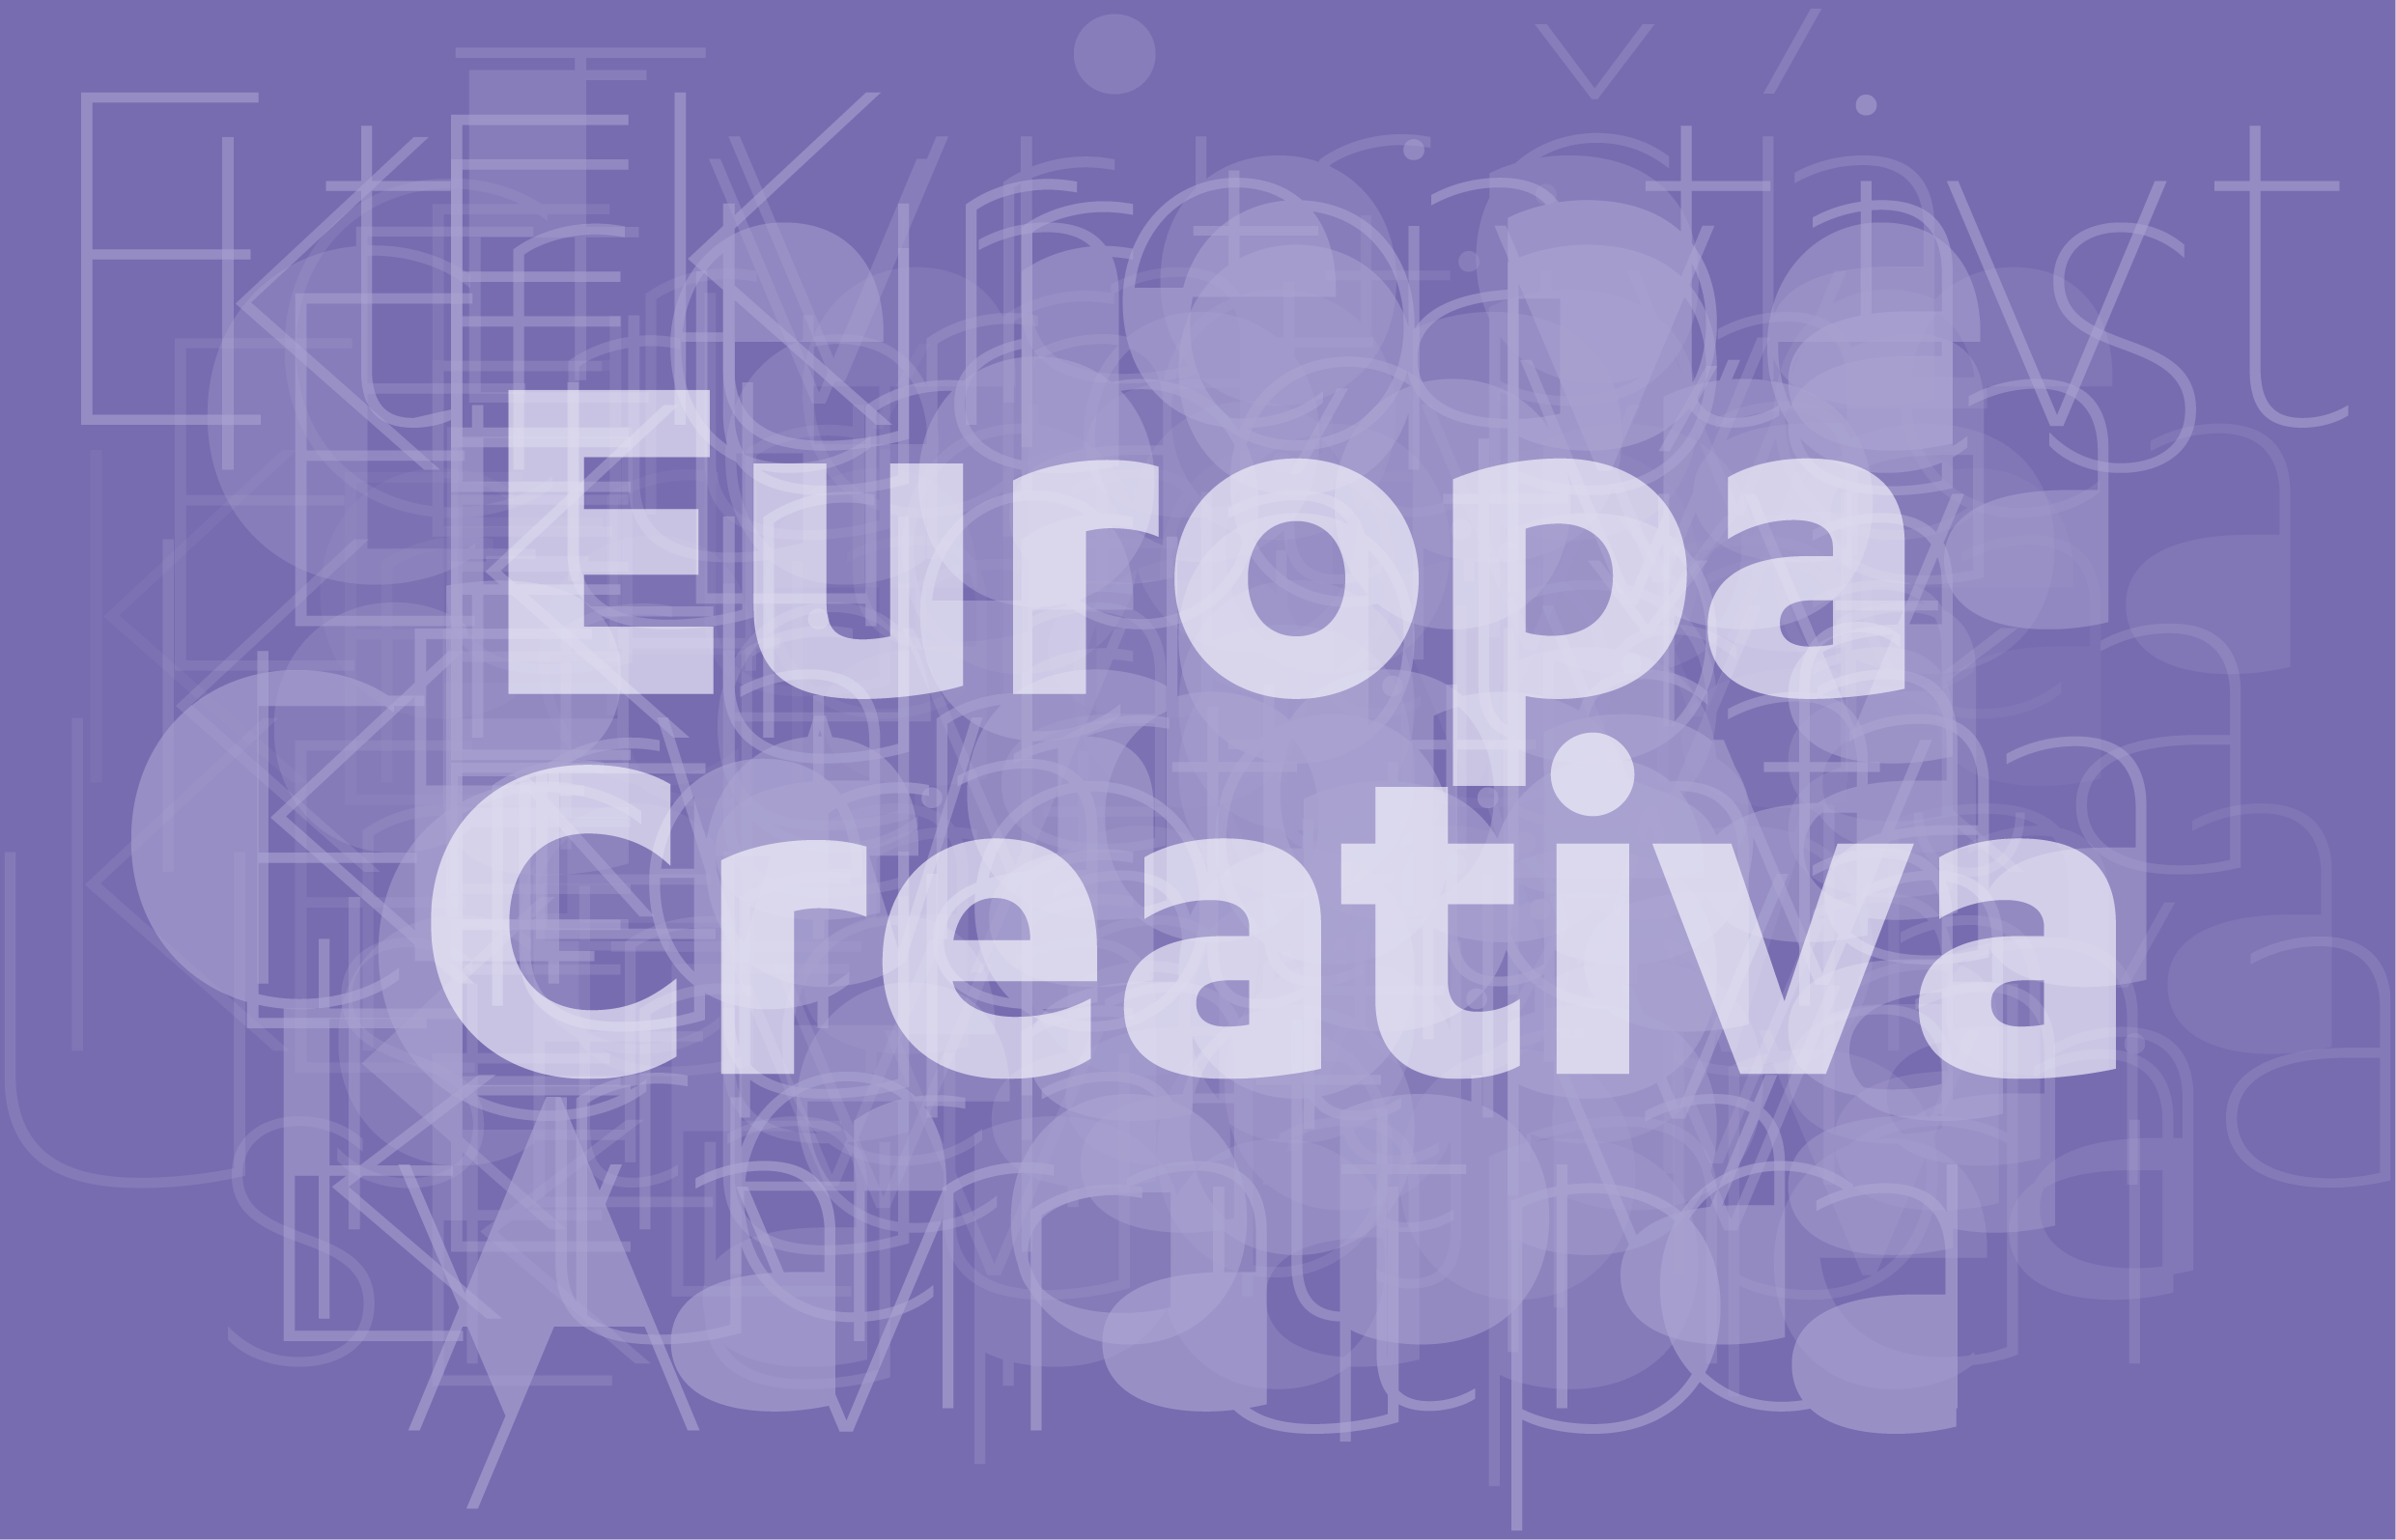 Servicios de la Oficina Europa Creativa España frente al COVID-19